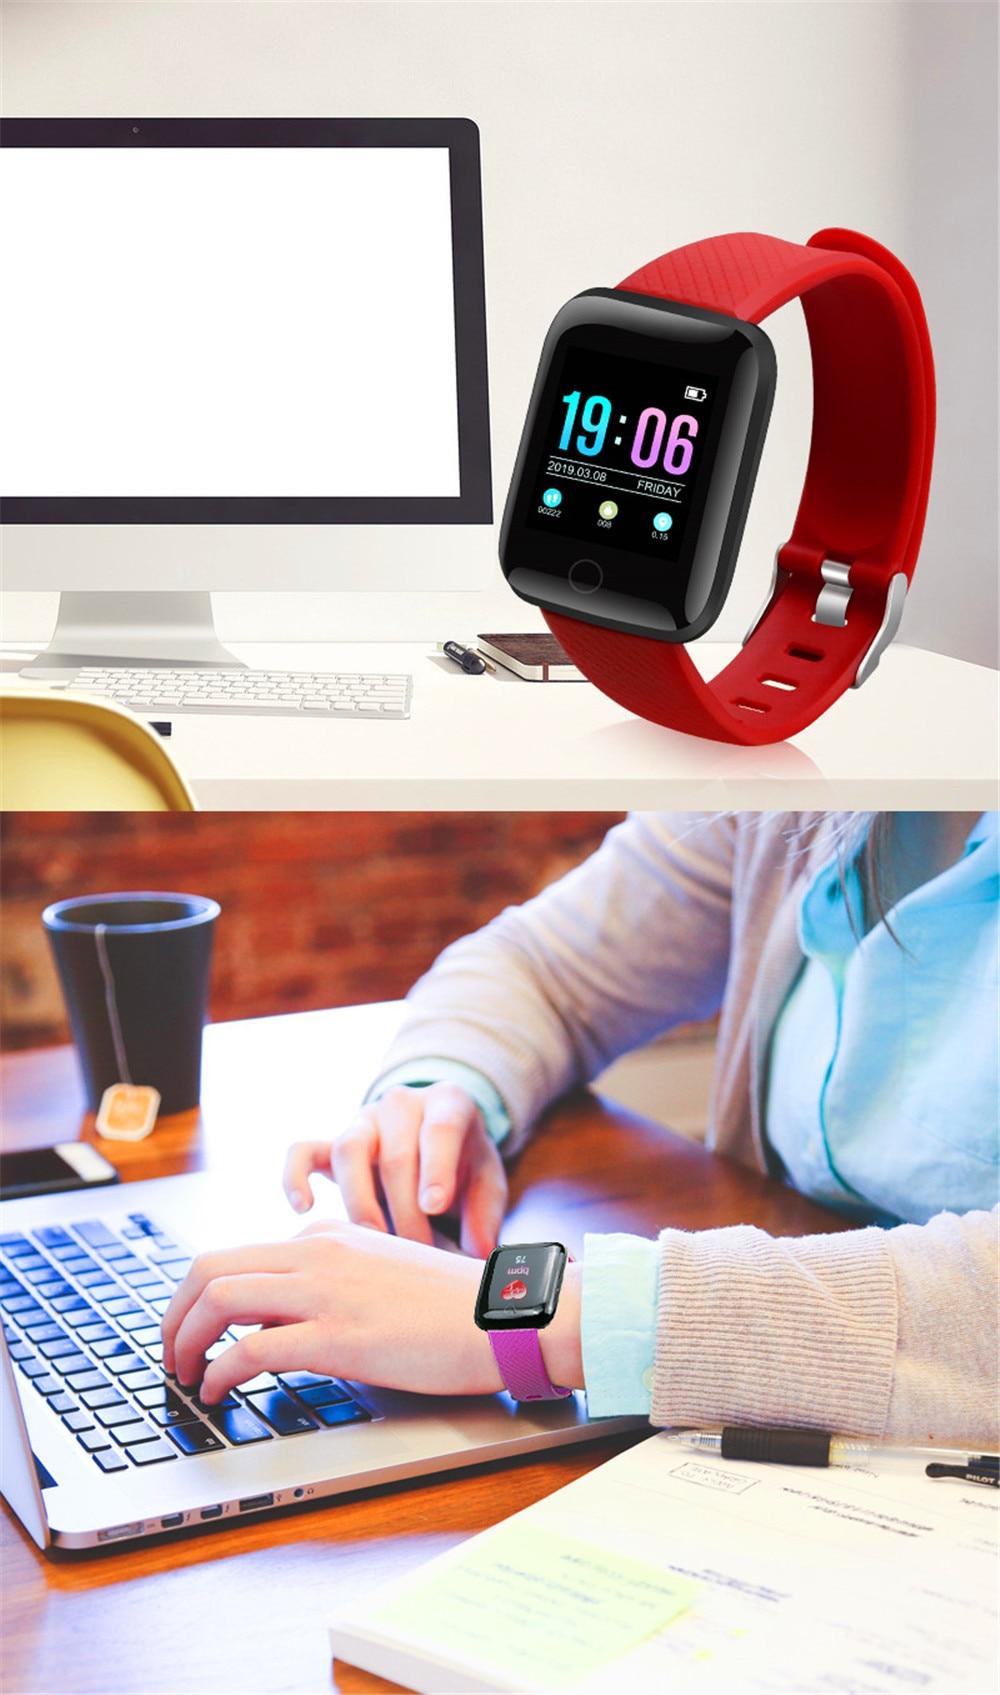 21-130435- Smart Watch Men Blood Pressure Waterproof Smartwatch Women Heart Rate Monitor Fitness Tracker Watch GPS Sport For Android IOS